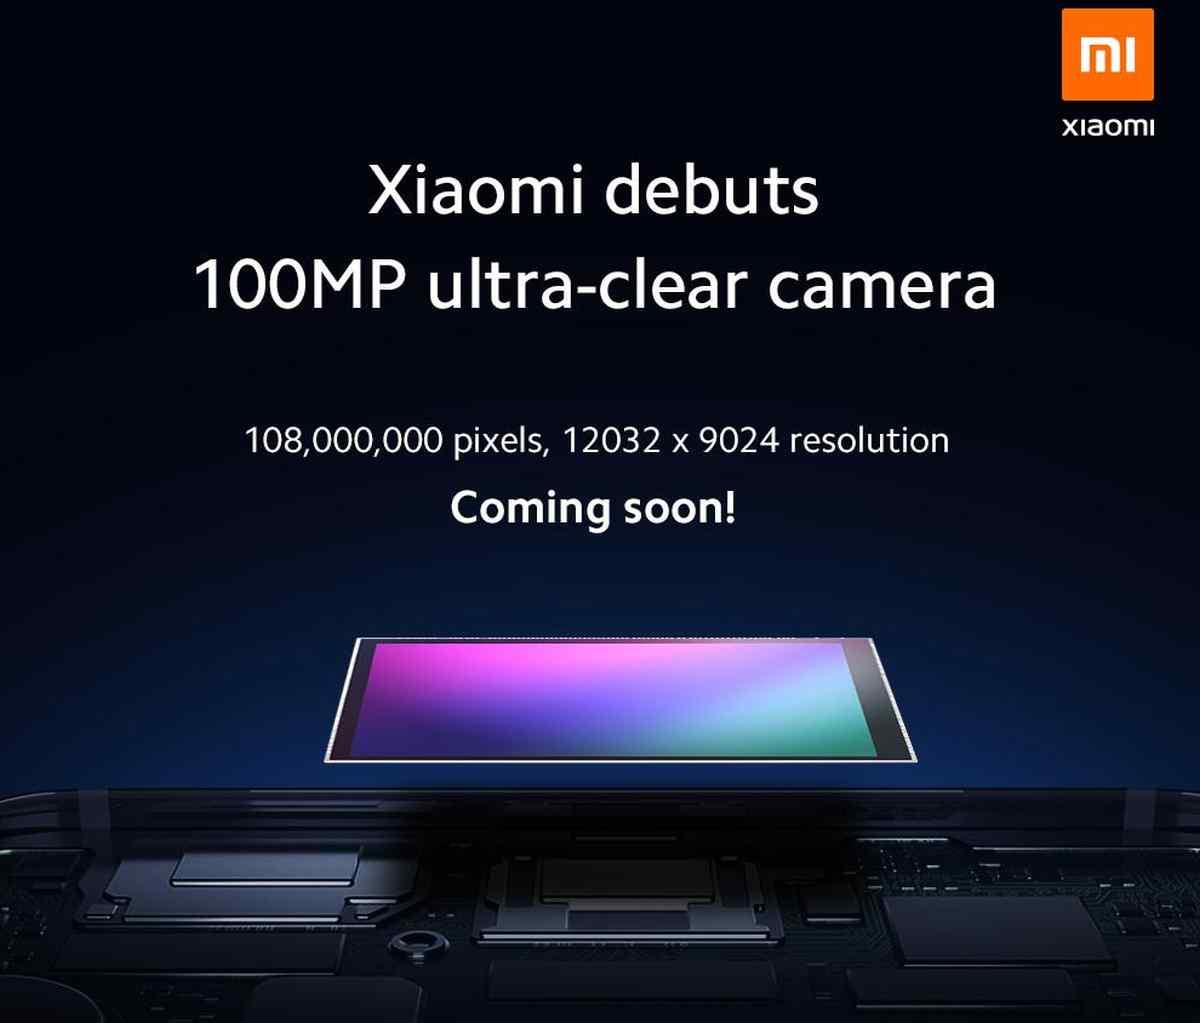 Xiaomi quiere lanzar un teléfono con cámara de 108MP